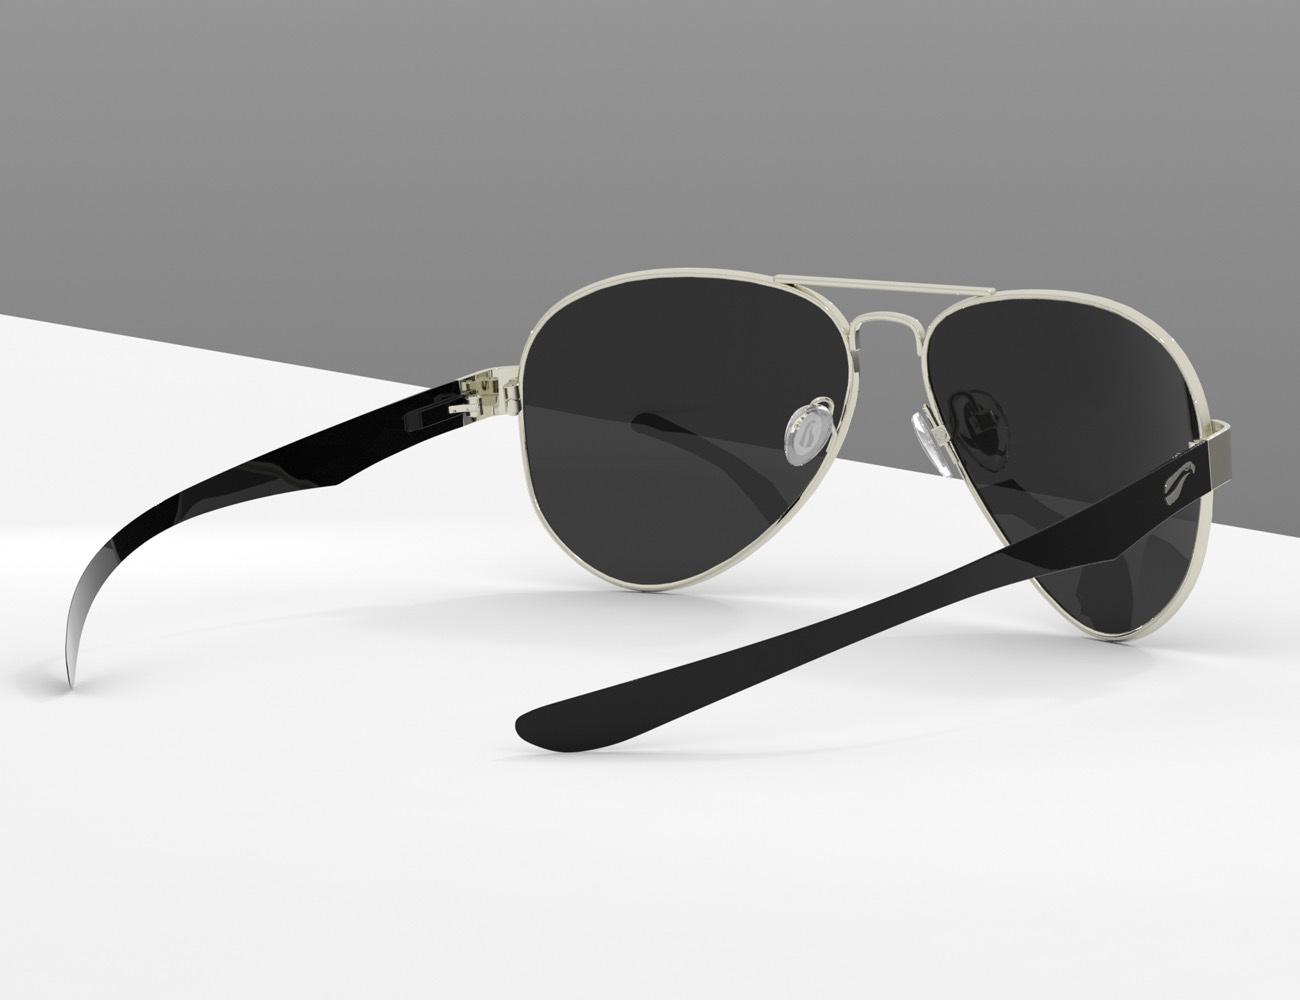 flying-eyes-sunglasses-03